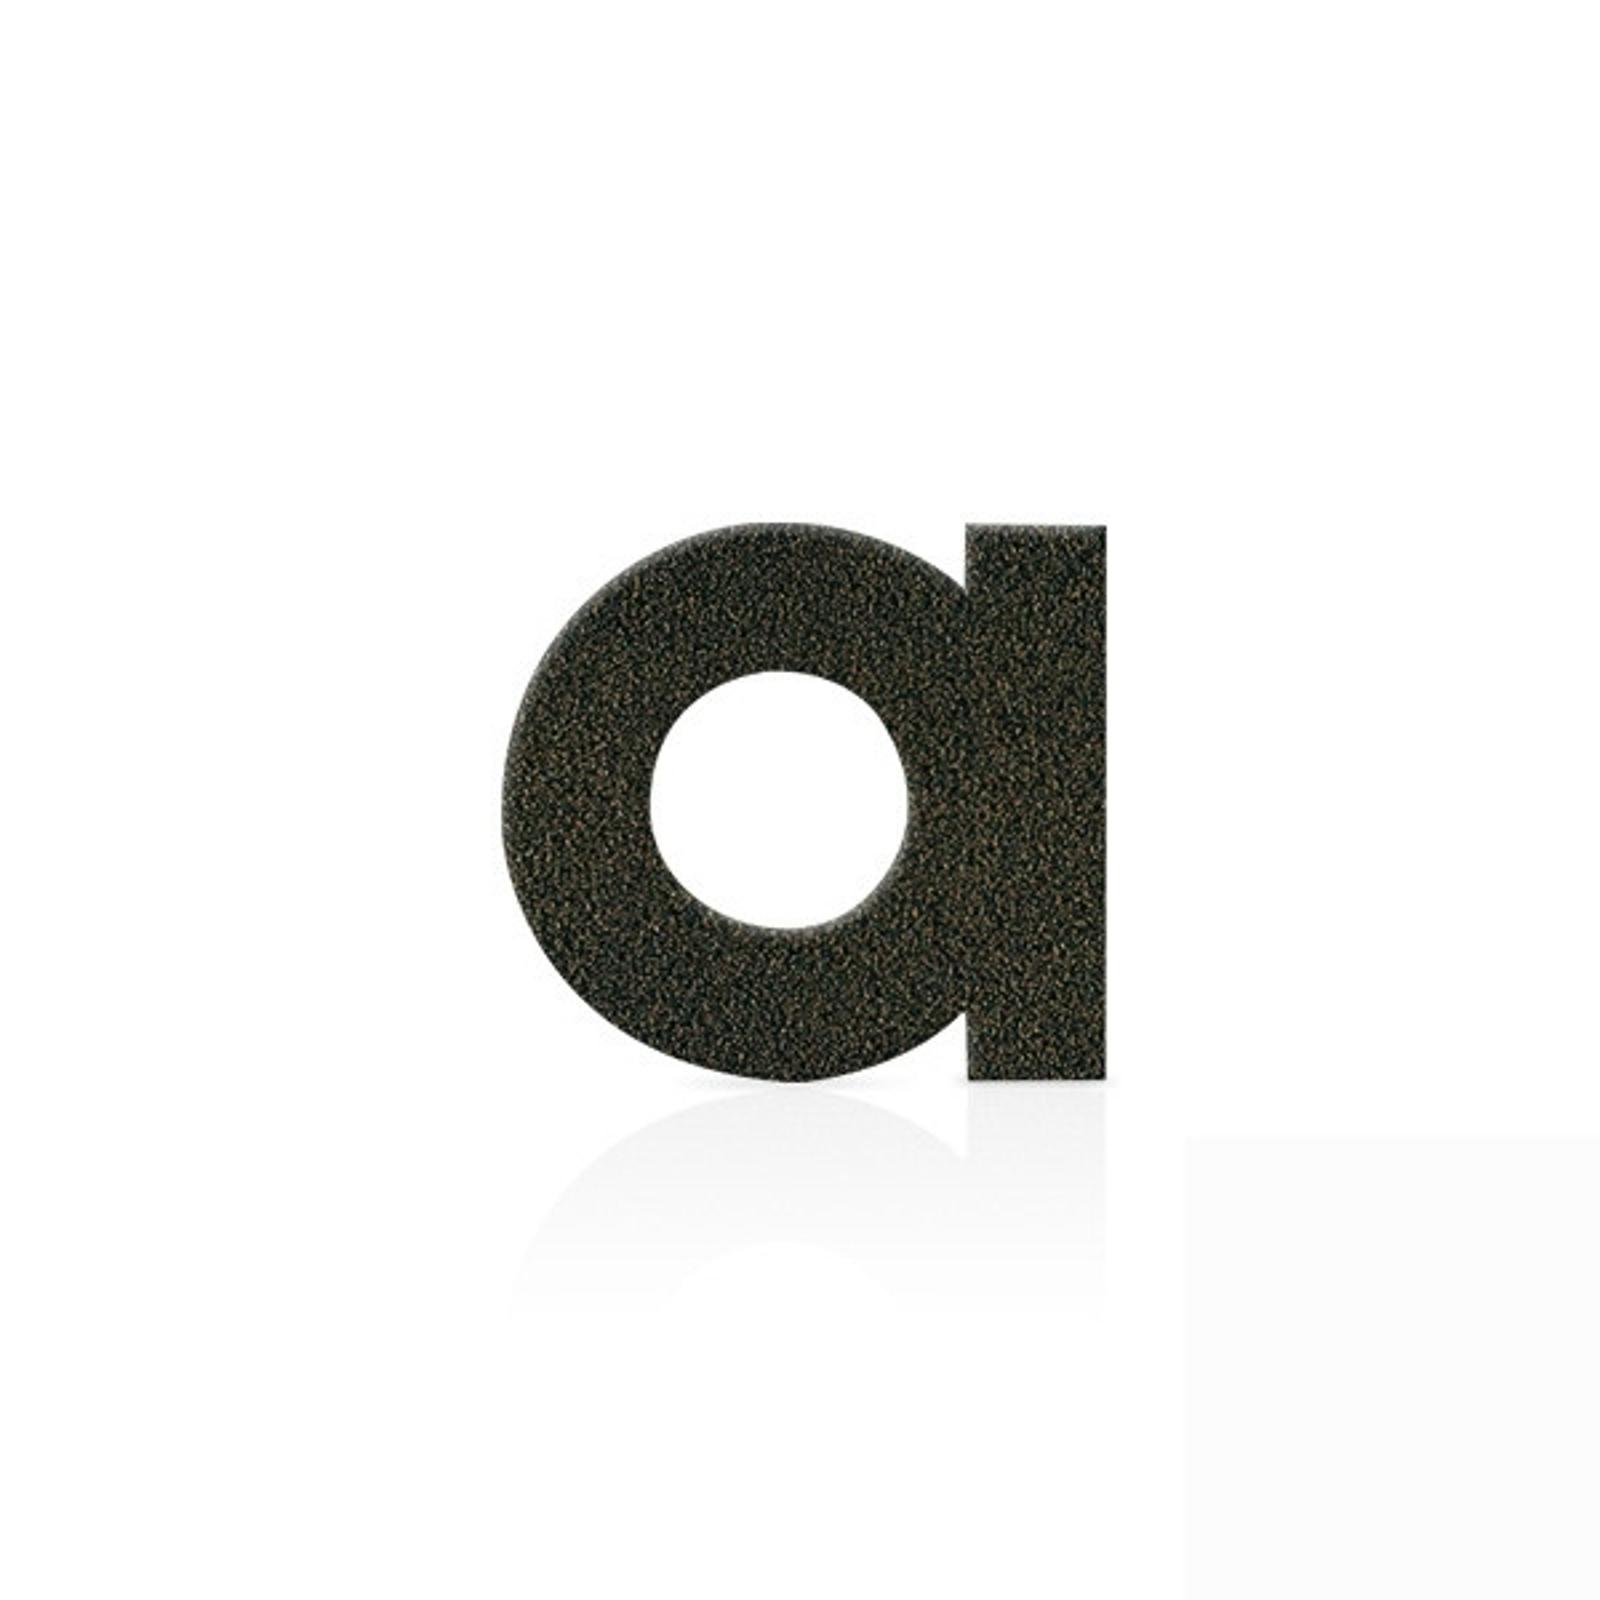 Gatenummerskilt rustfritt stål bokstaven a mokkabr